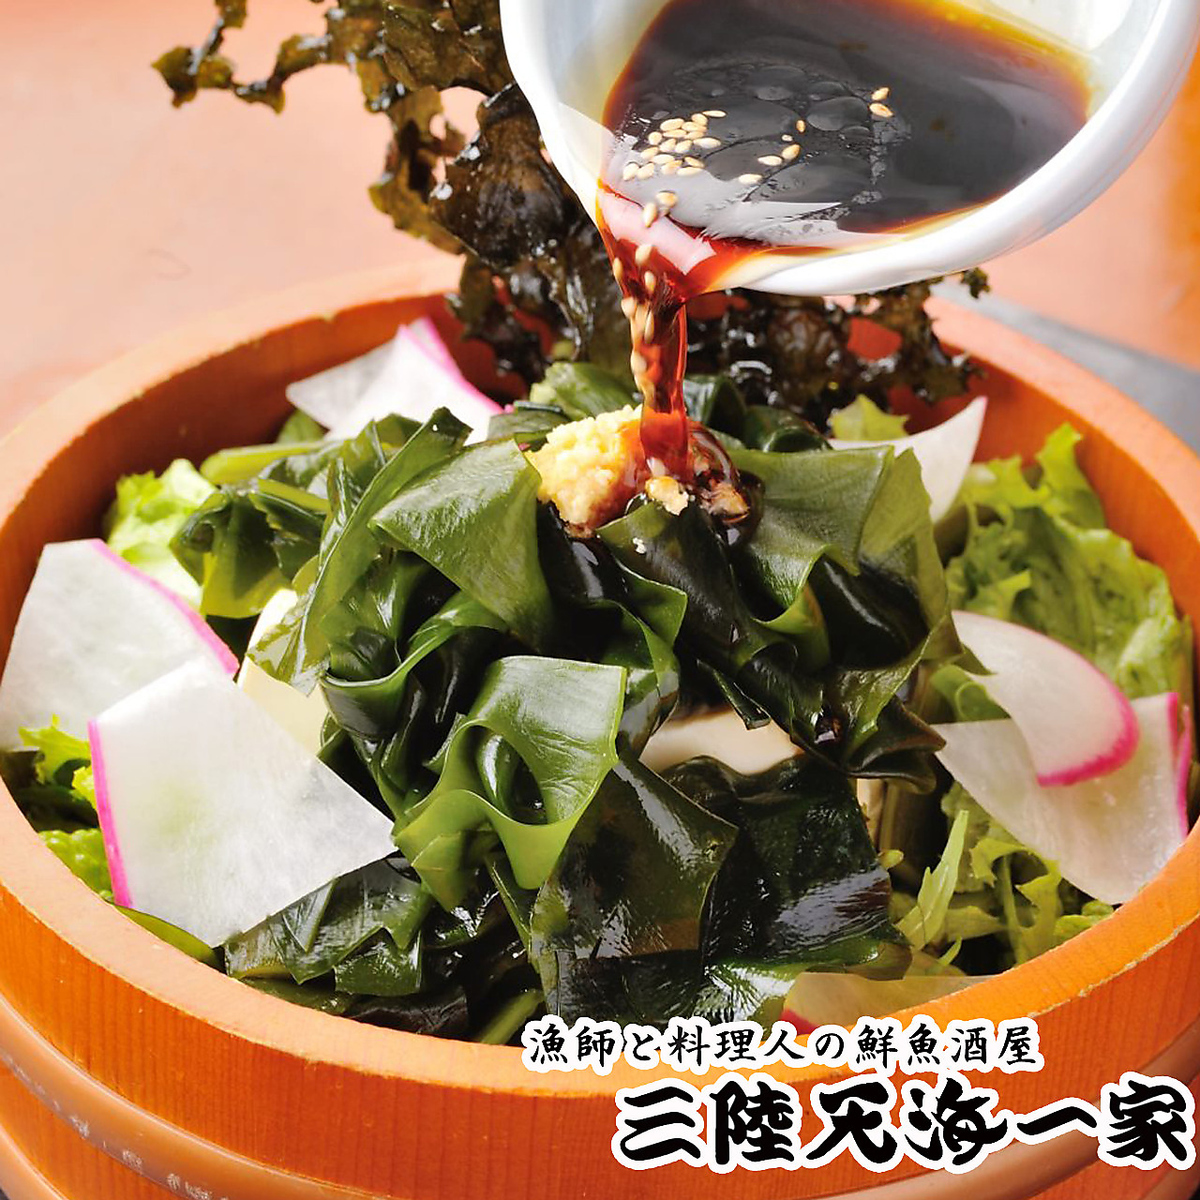 與Jojimahama的海藻沙拉